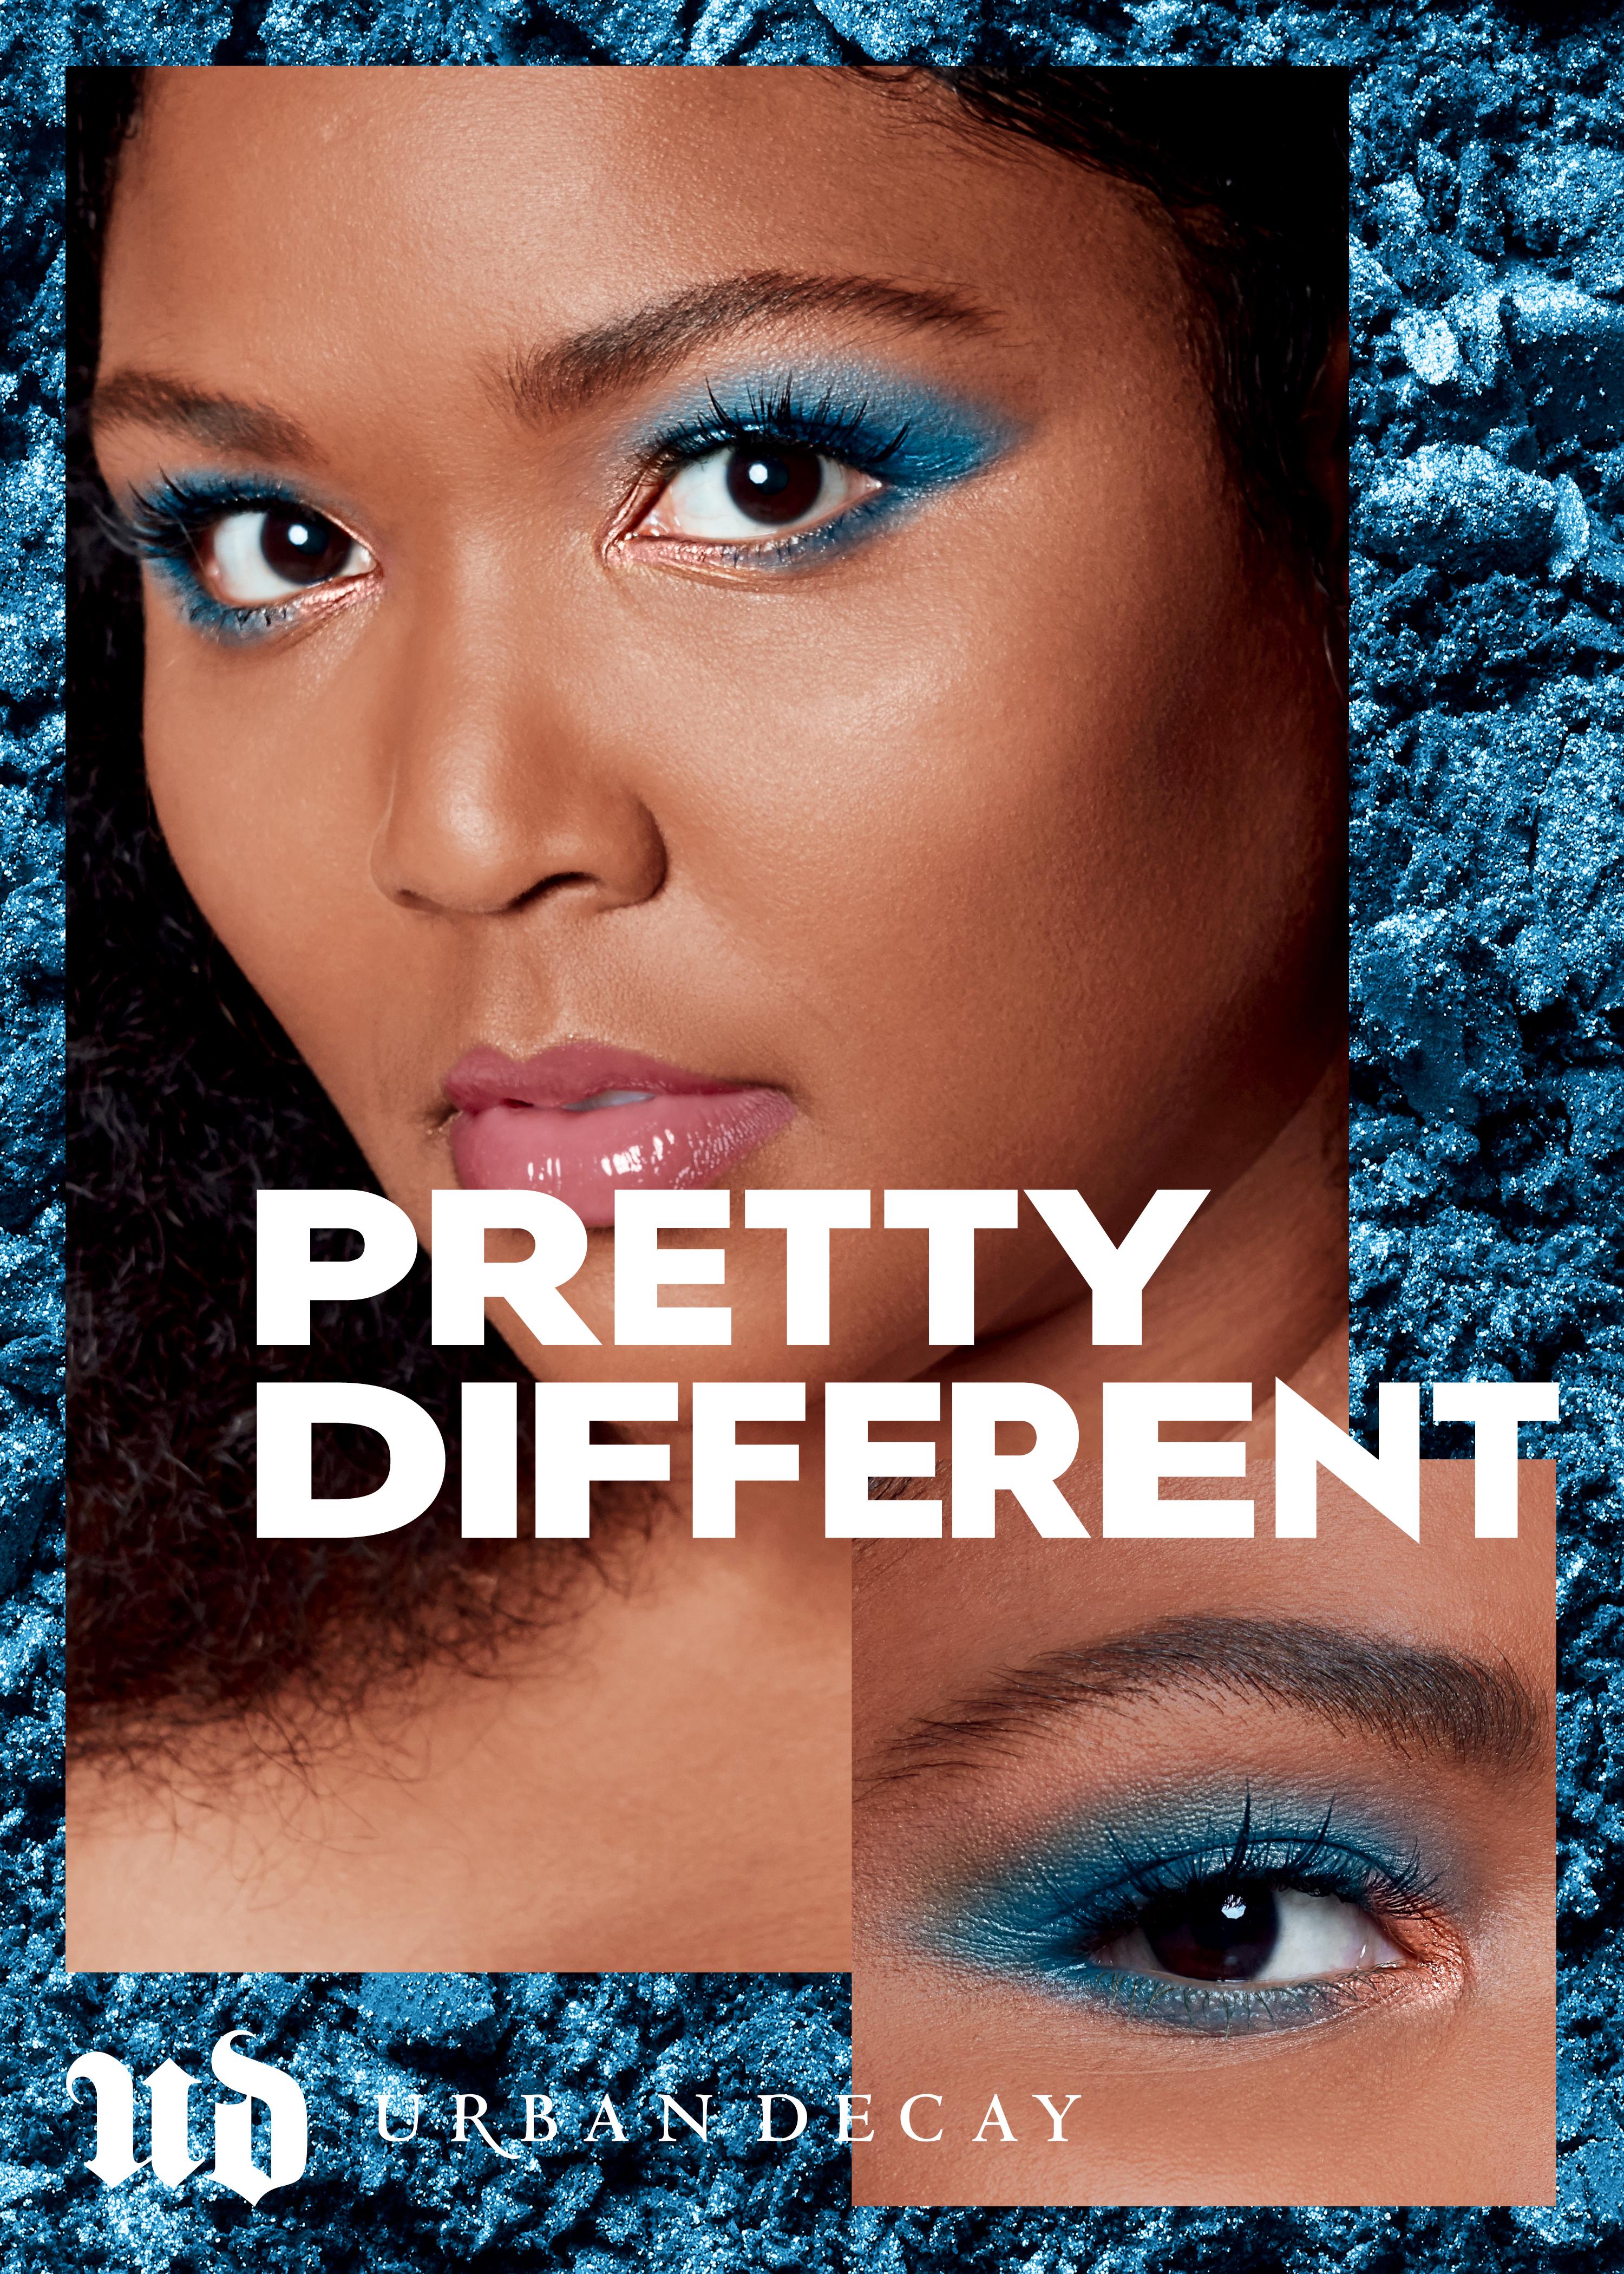 19FALL REBRAND 20x28 Lizzo CL, Ezra Miller, Joey King, Karol G i Lizzo podižu stvari na novi nivo  kampanjom Pretty Different